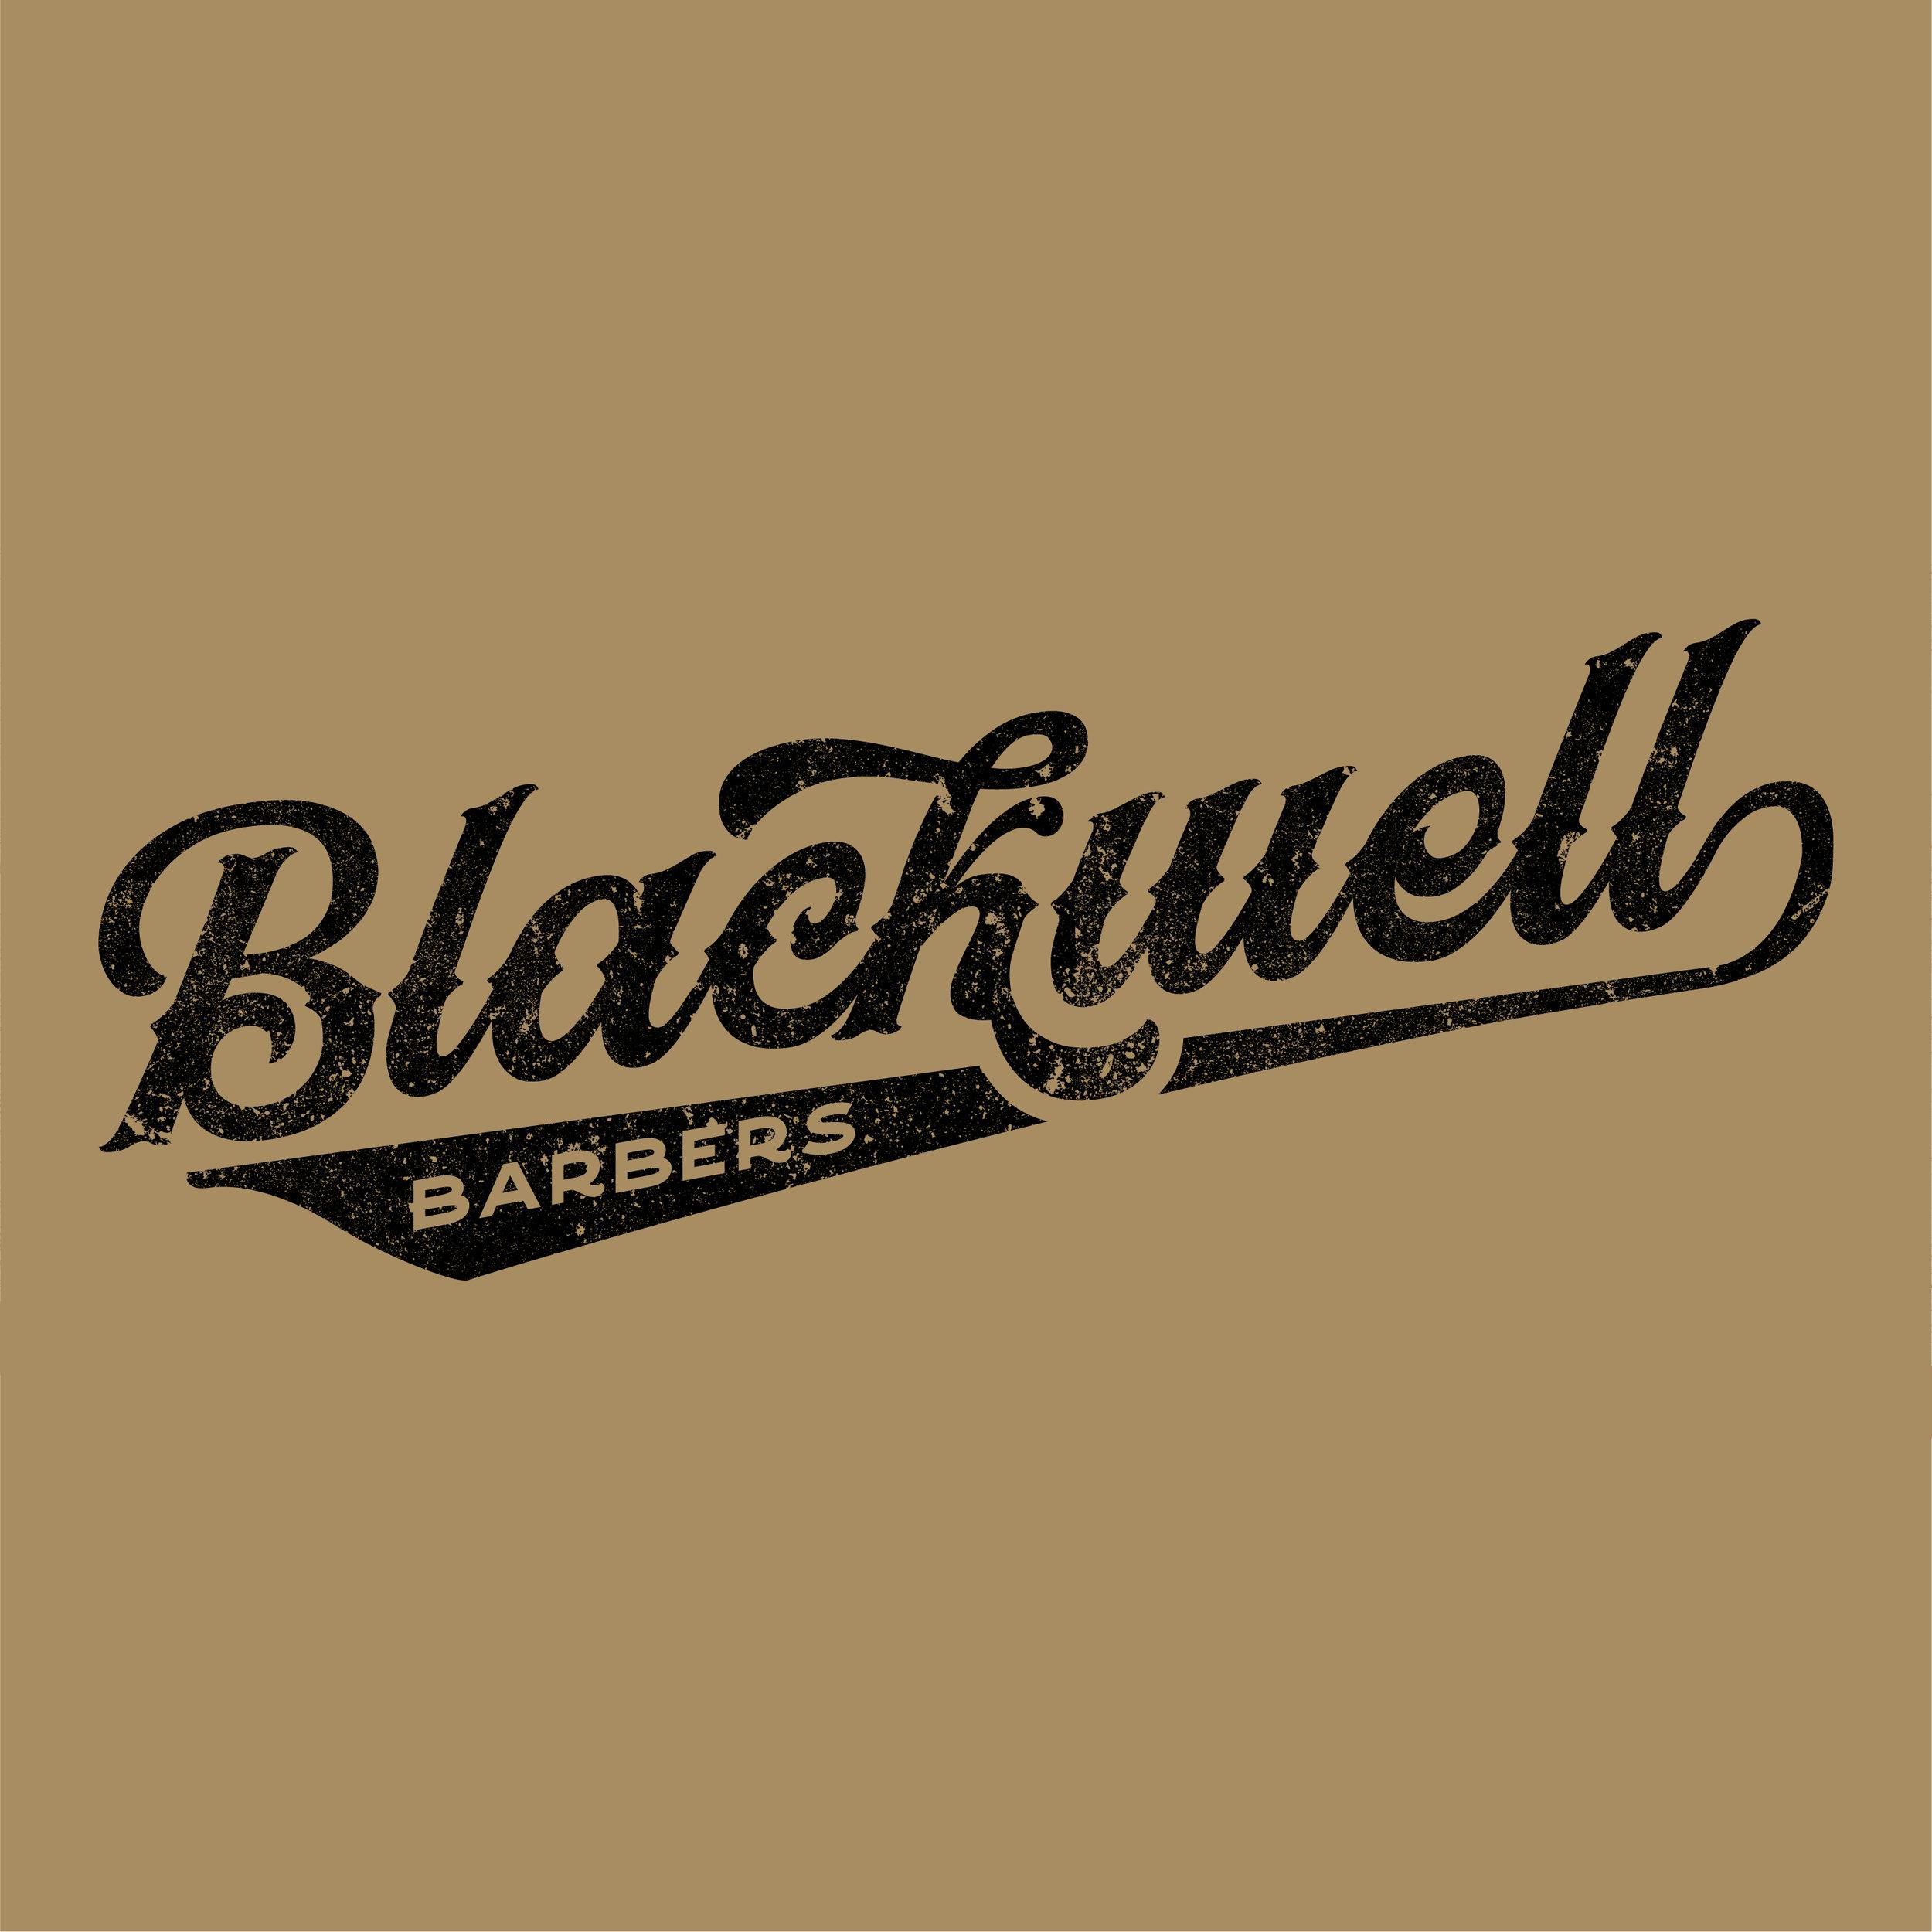 Blackwell.jpg